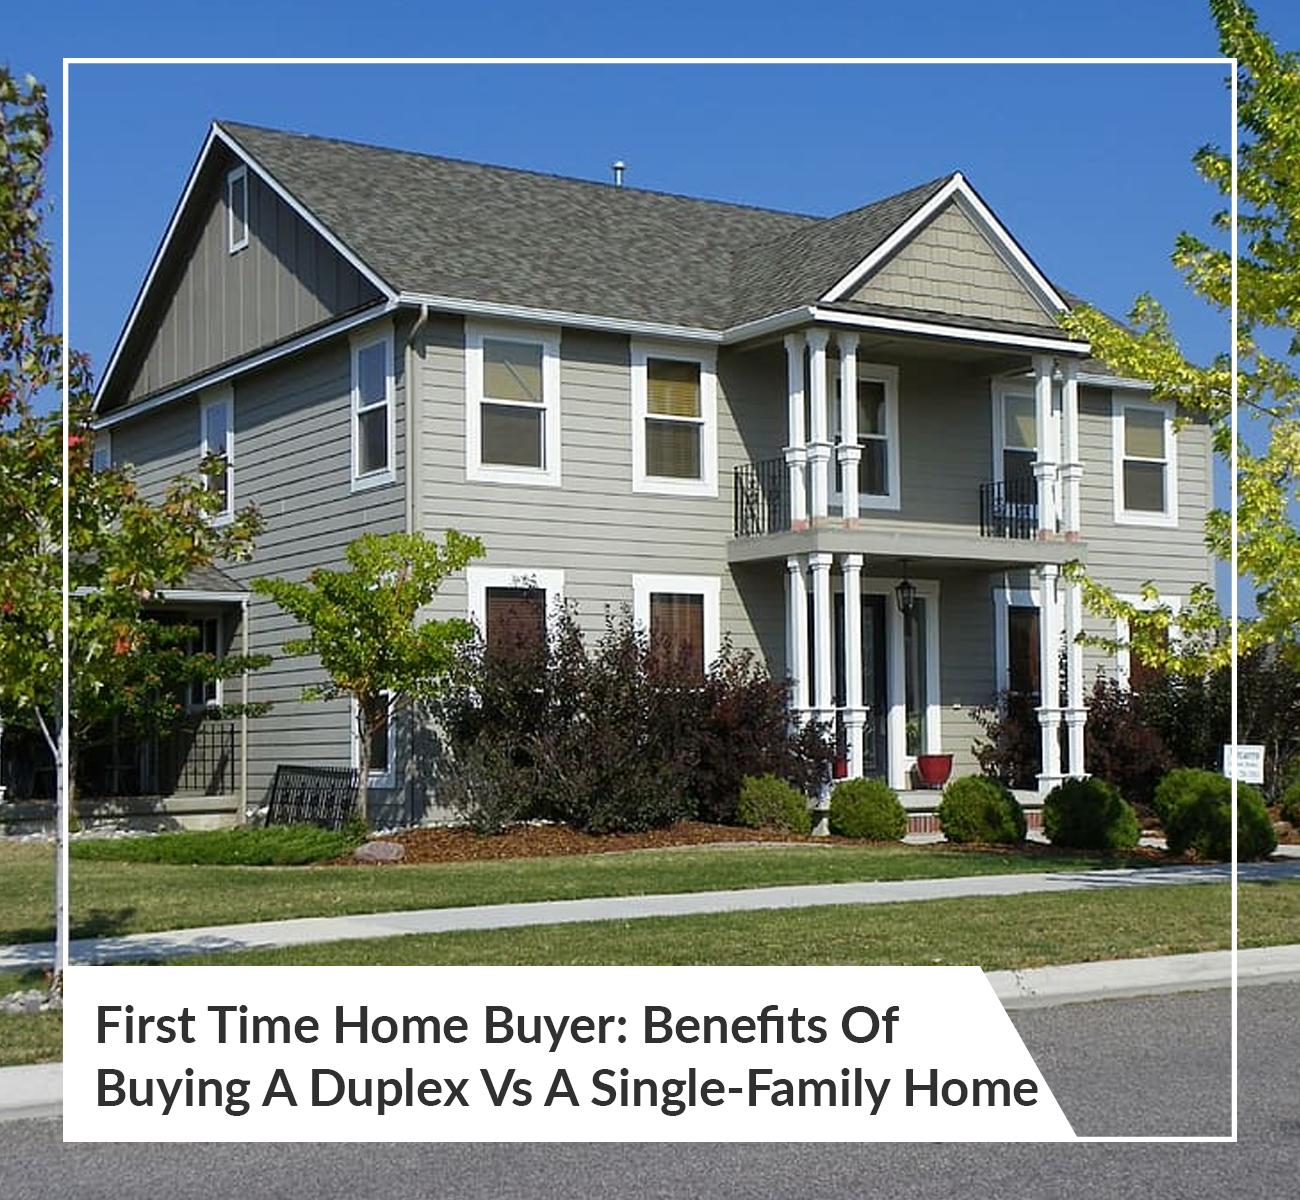 Duplex Vs Single-Family Home